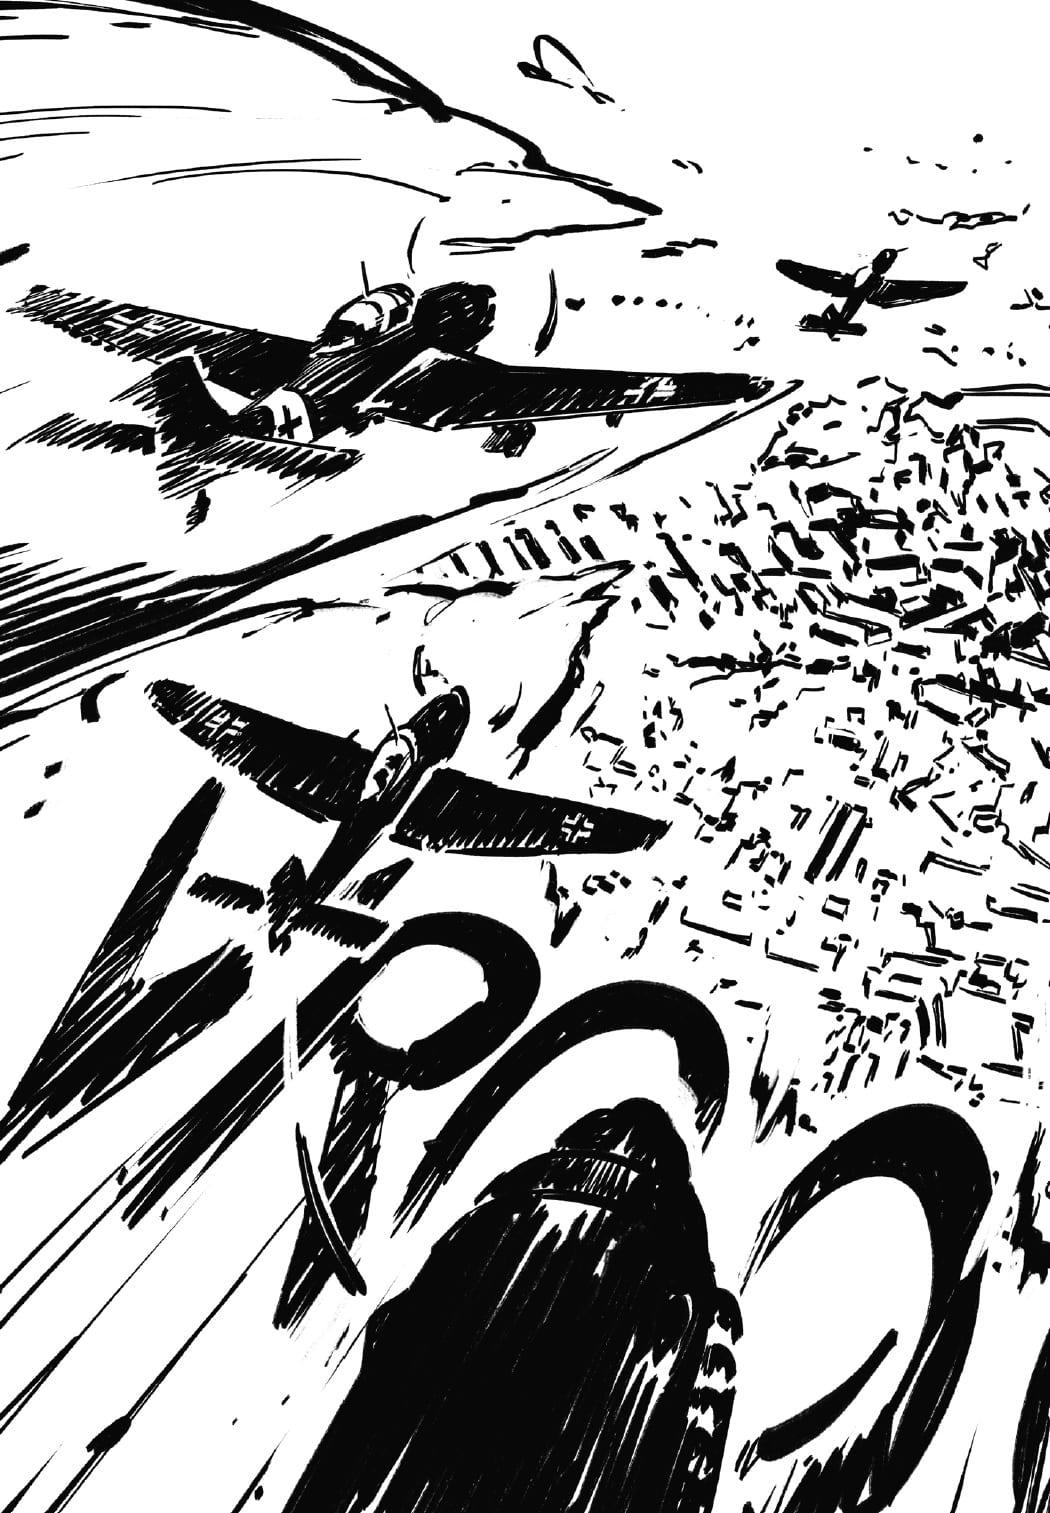 Anteprima: La neve di Stalingrado (Davide La Rosa, Valerio Befani)_Anteprime